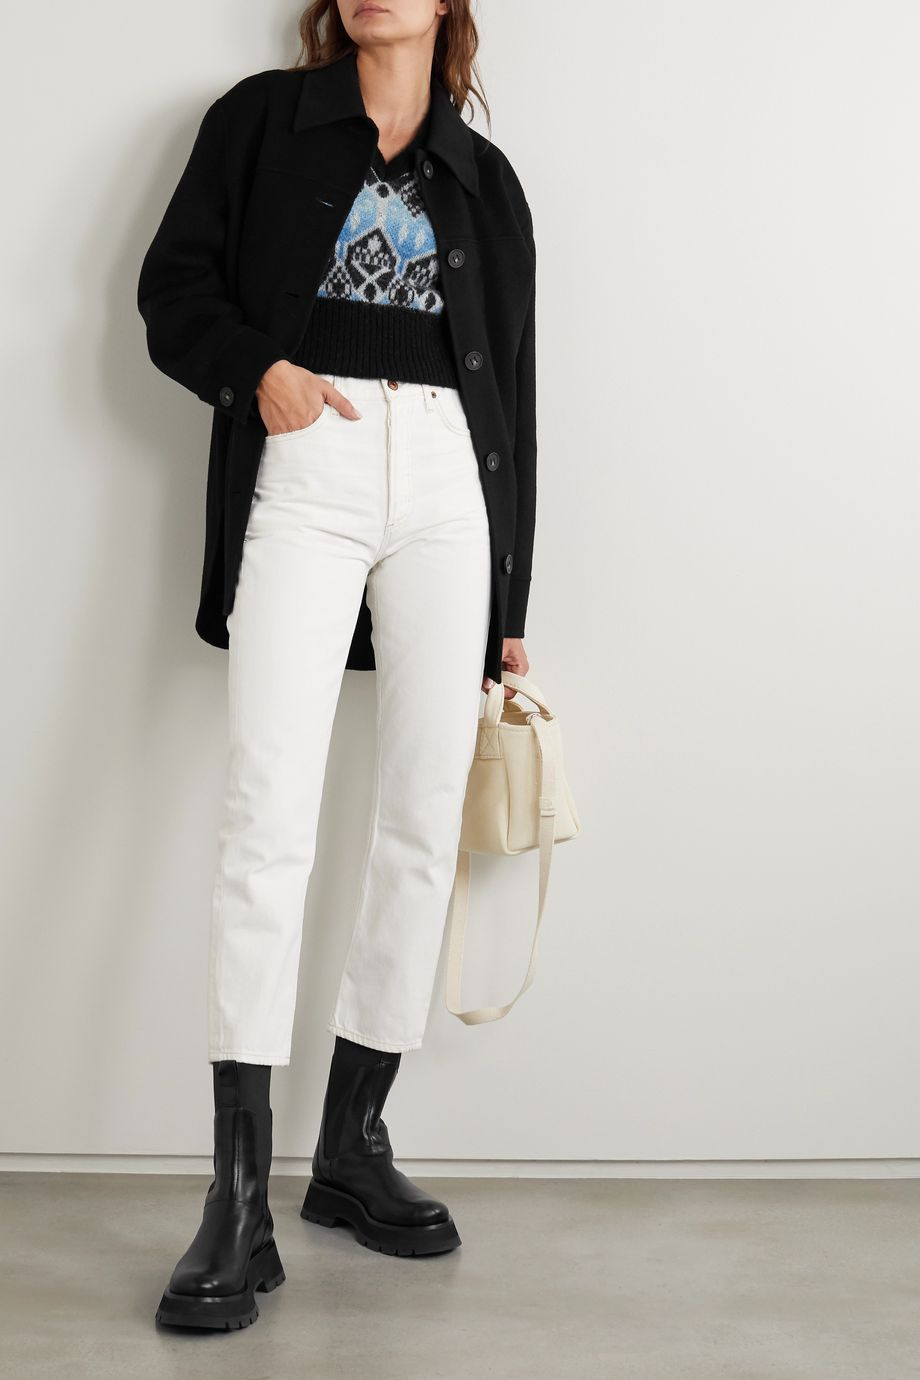 Acne Studios Wool shirt jacket